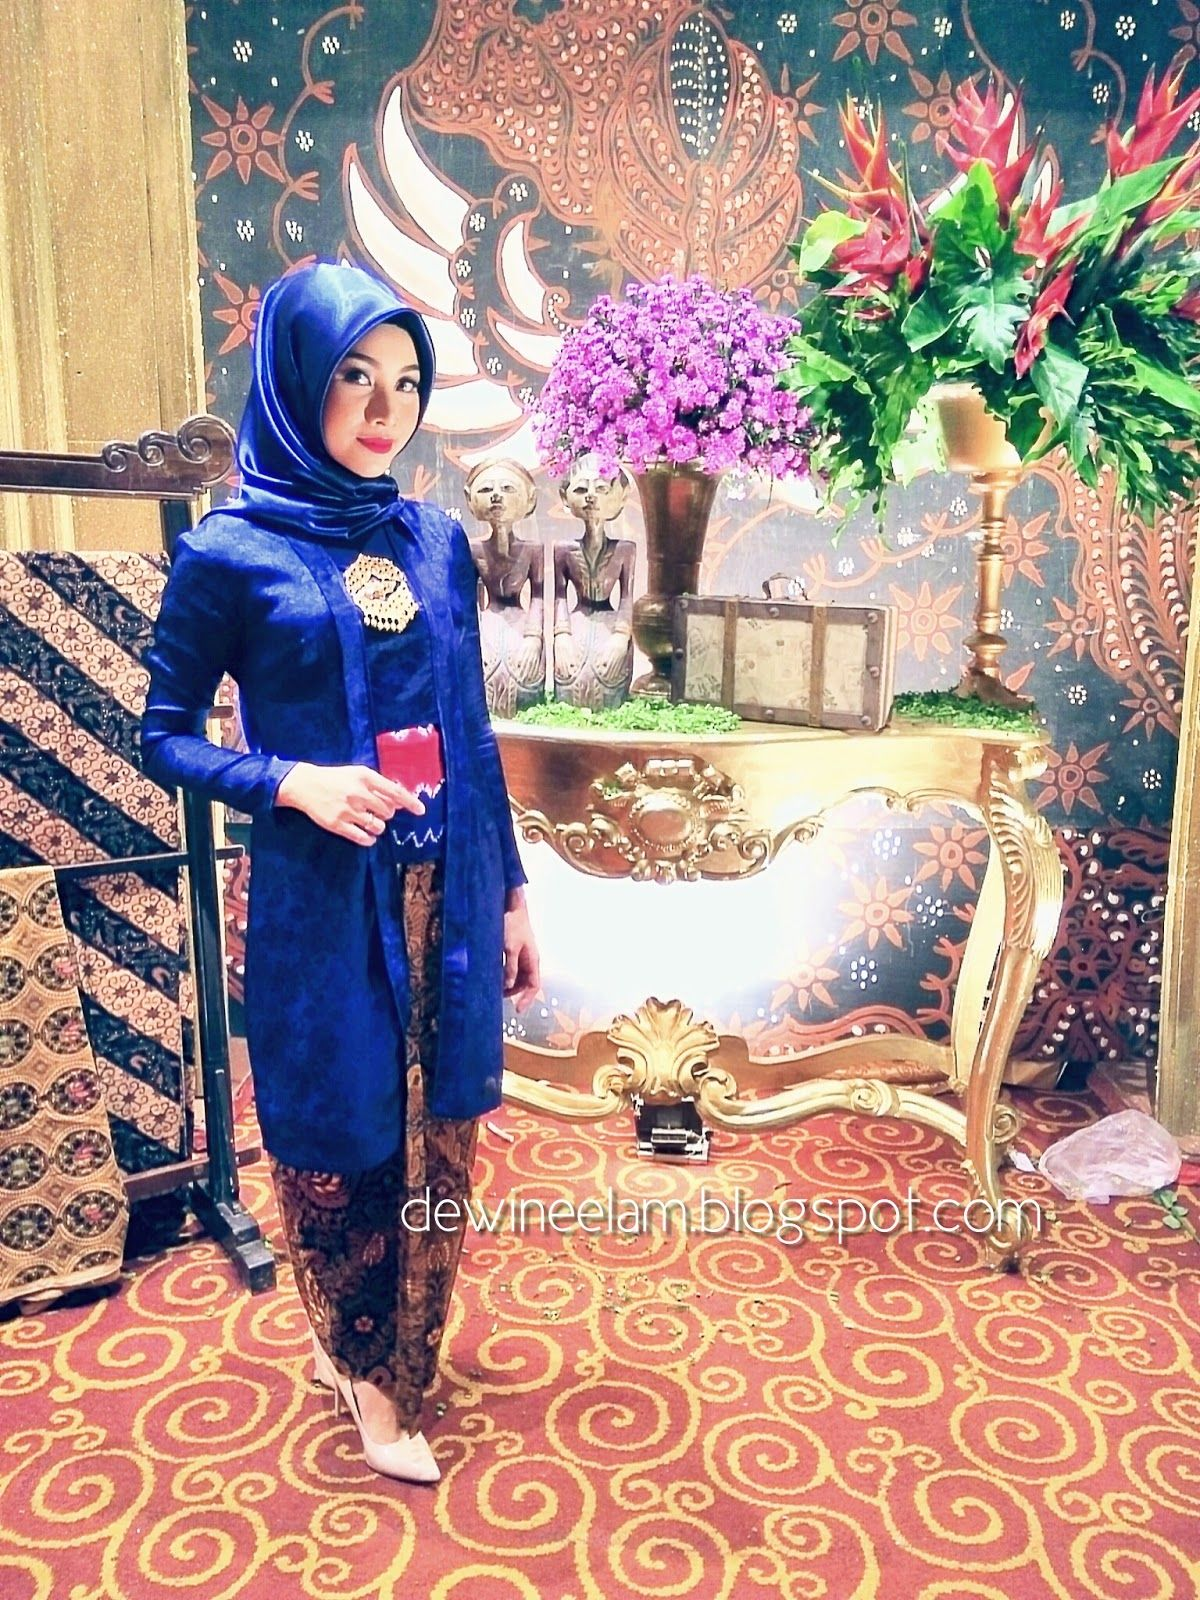 Tutorial Hijab Untuk Kebaya Kutu Baru : tutorial, hijab, untuk, kebaya, Anything